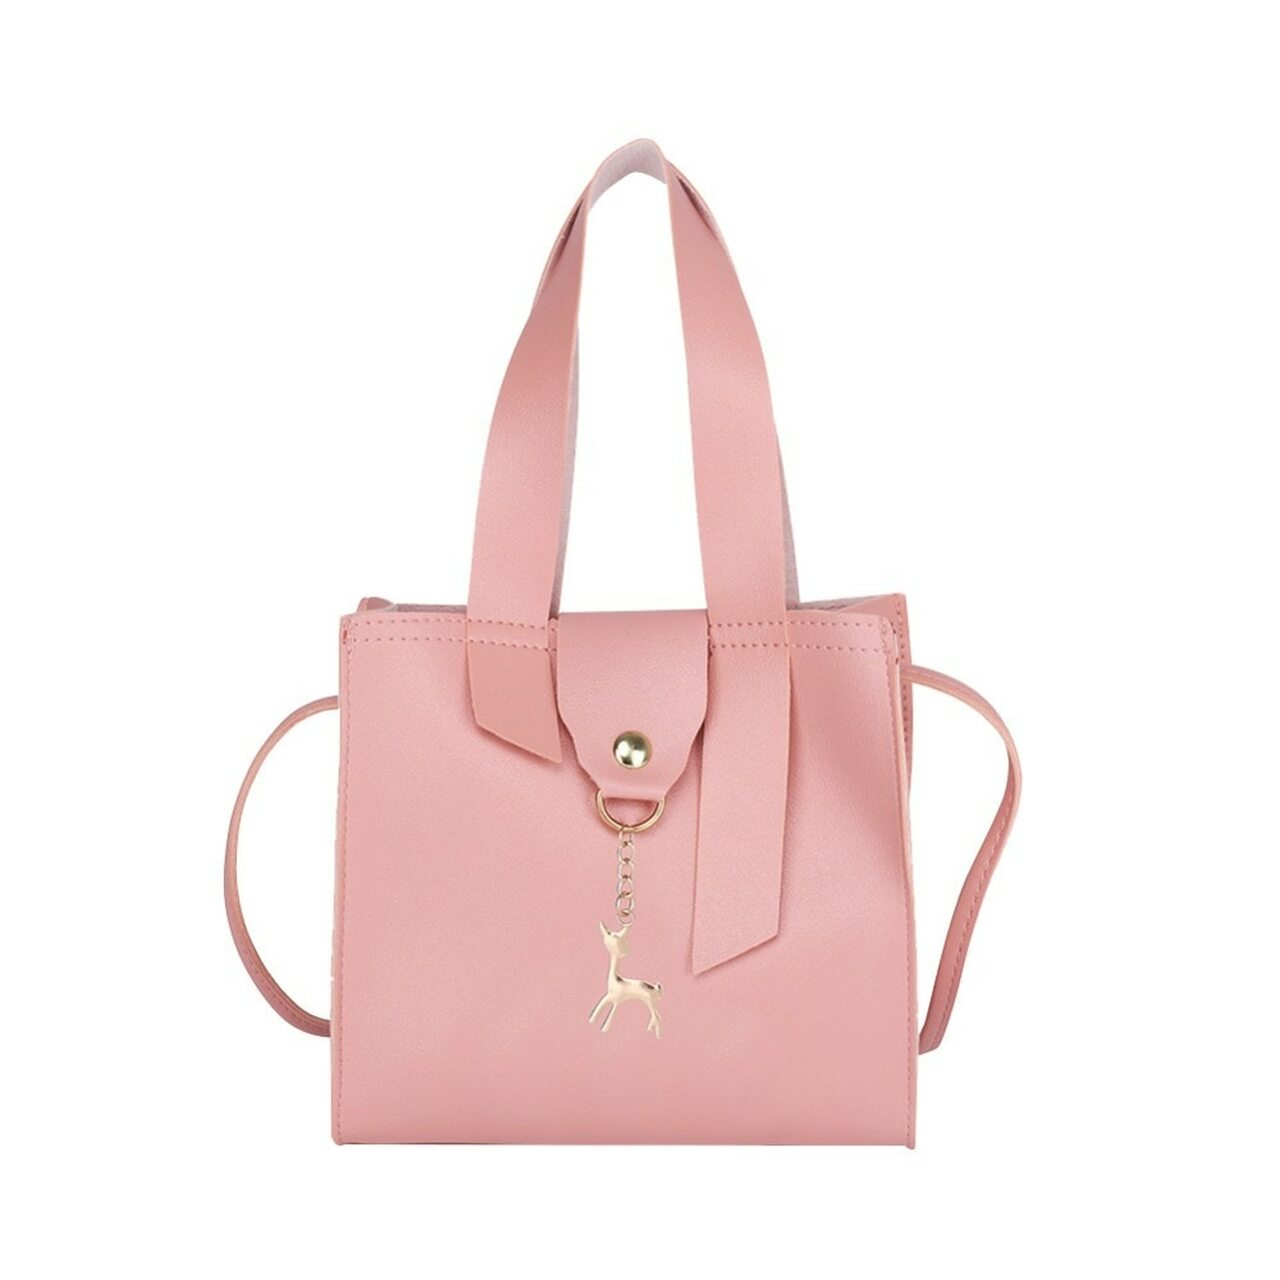 8470ac74f00 2019 Women Casual Shoulder Handbags PU Leather Girls Star Crossbody  Messenger Bags Ladies Fashion Large Capacity Handbag New